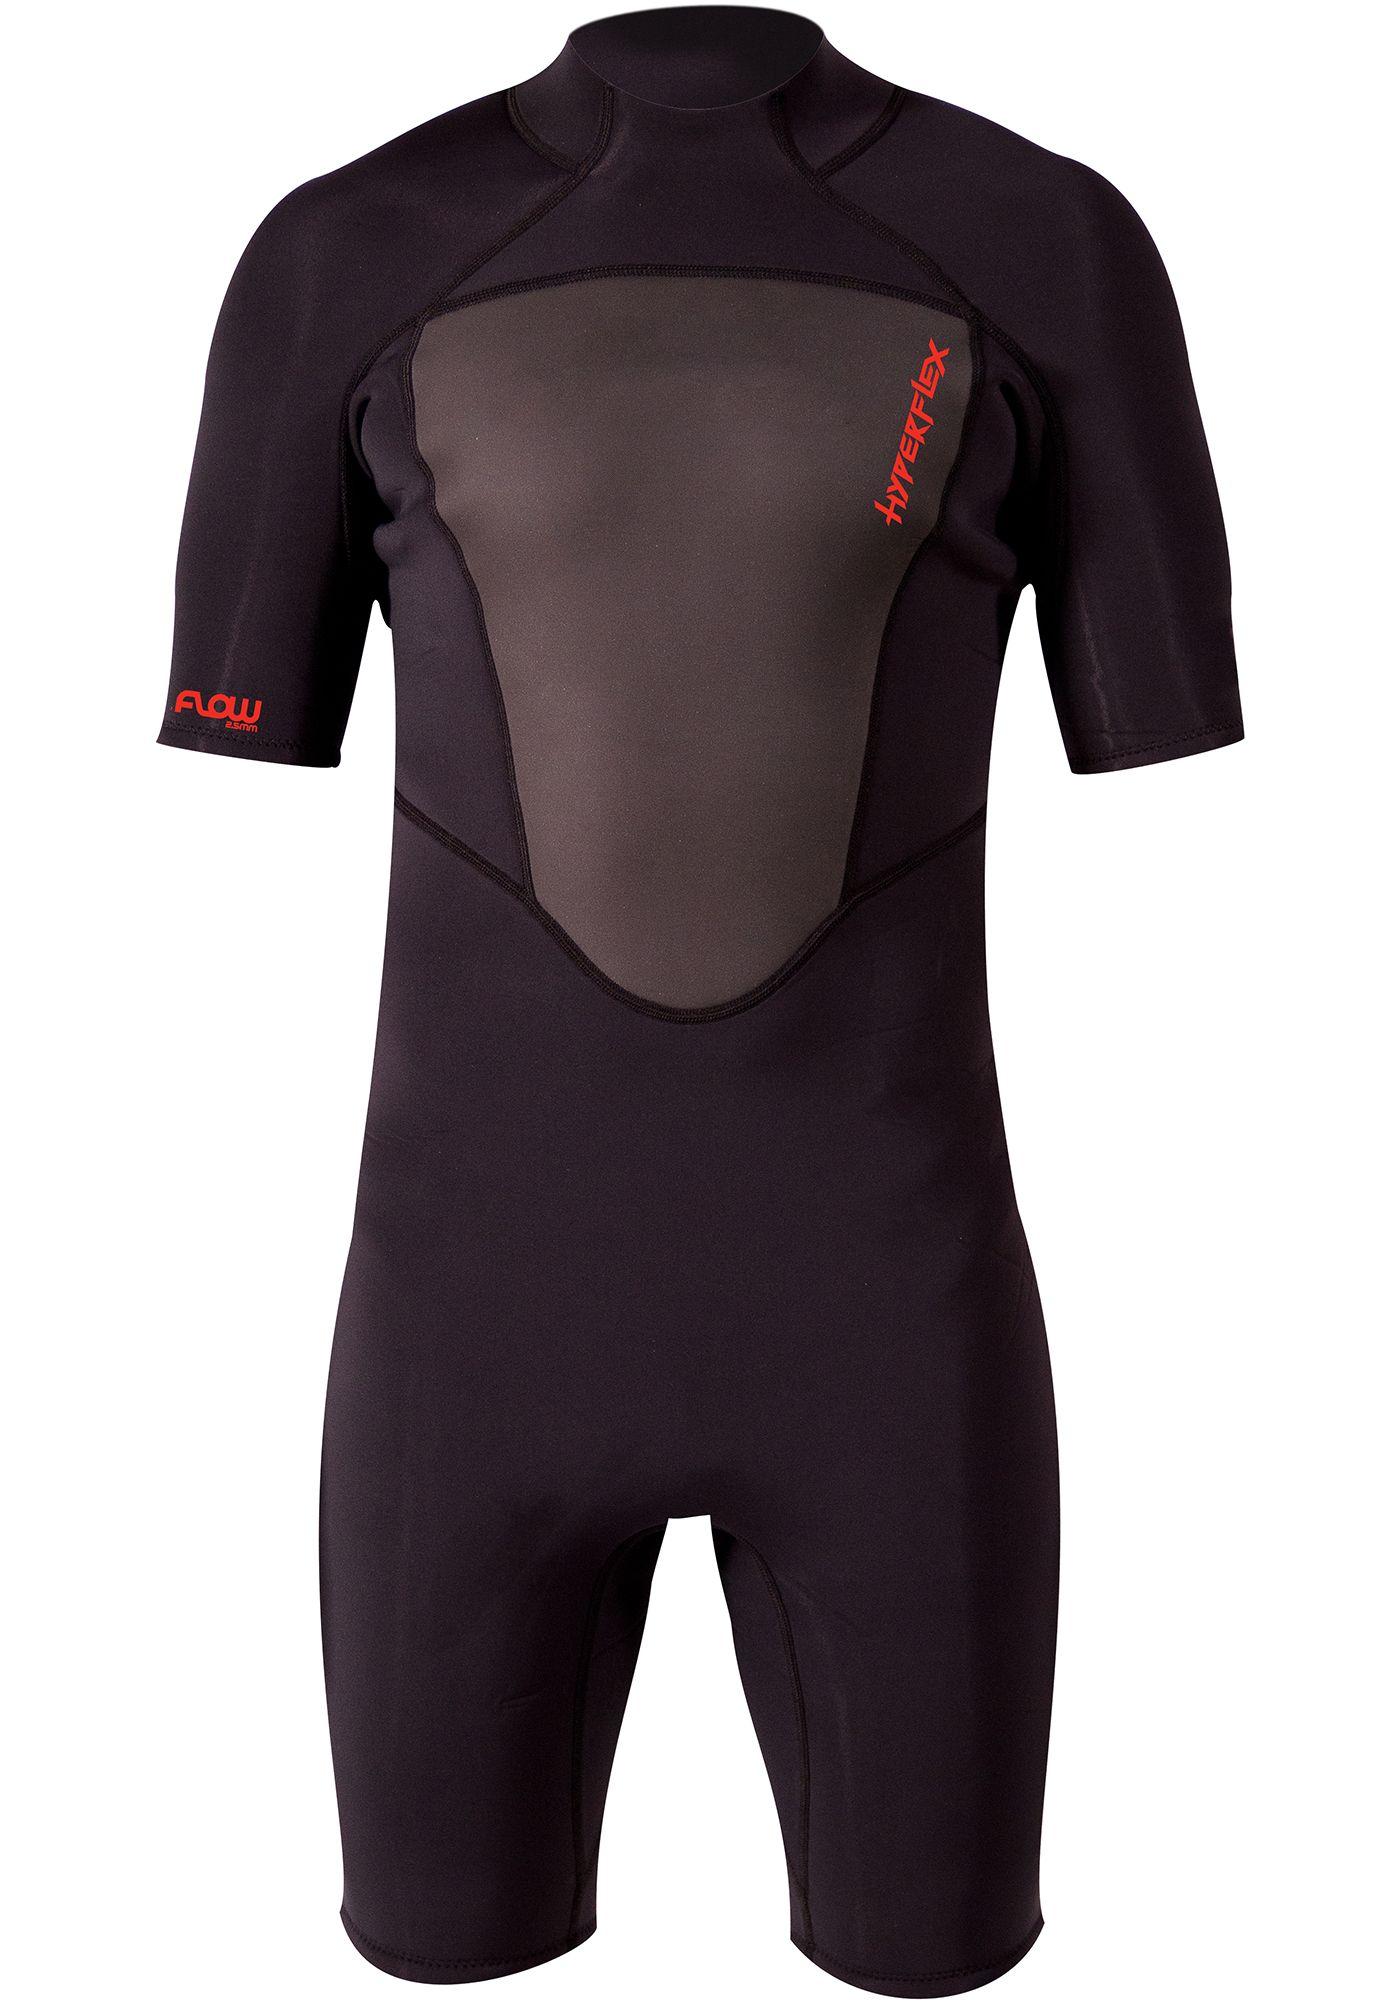 Hyperflex Men's Flow Series 2.5mm Spring Wetsuit